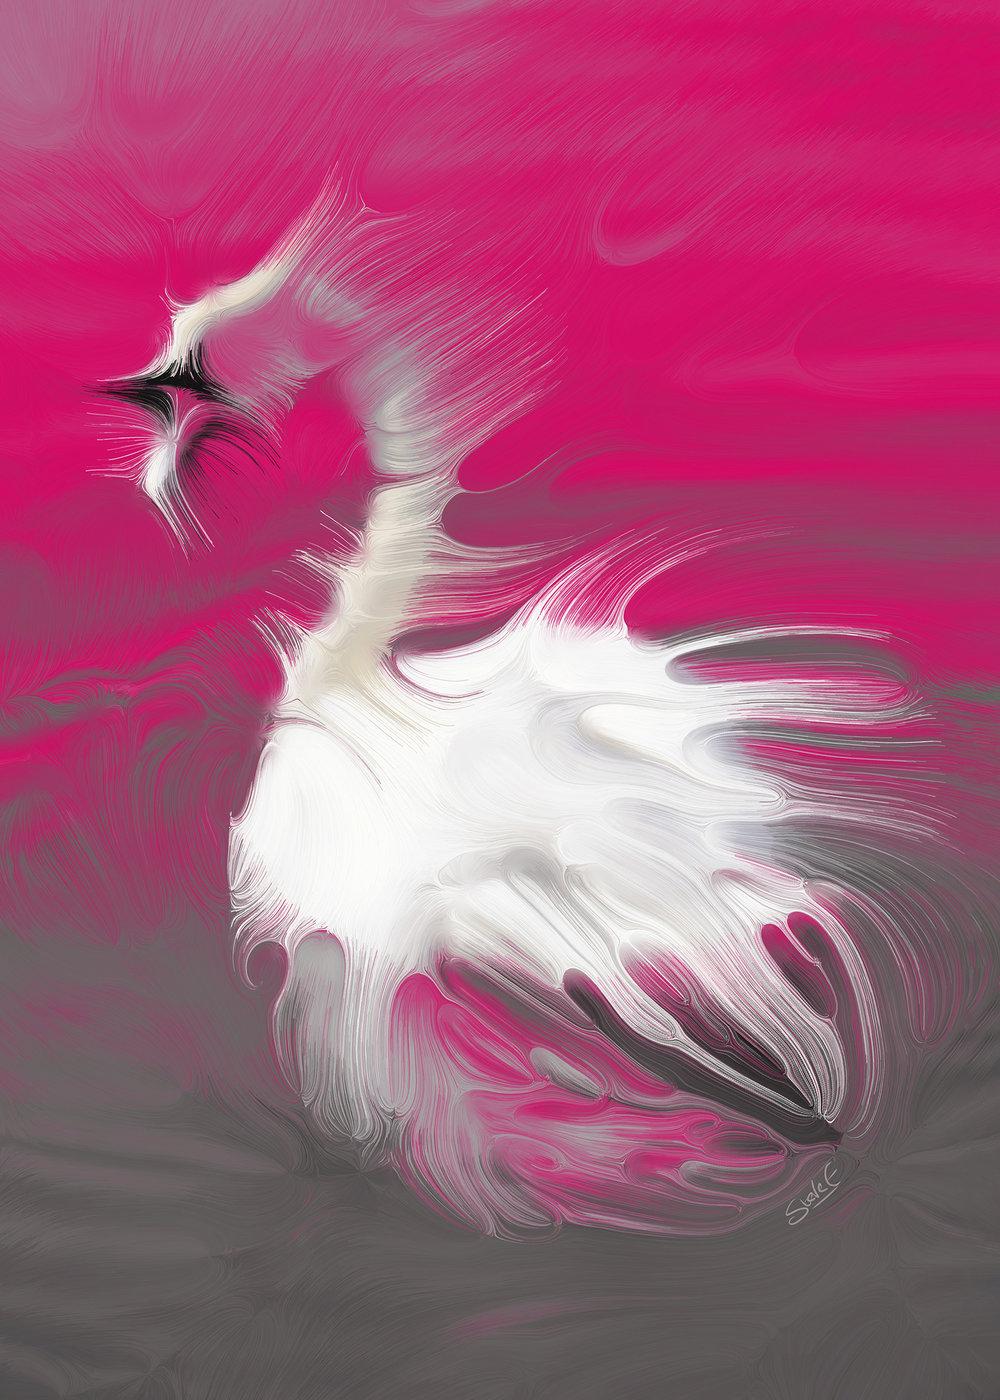 Swan_A9771_signedsmall.jpg